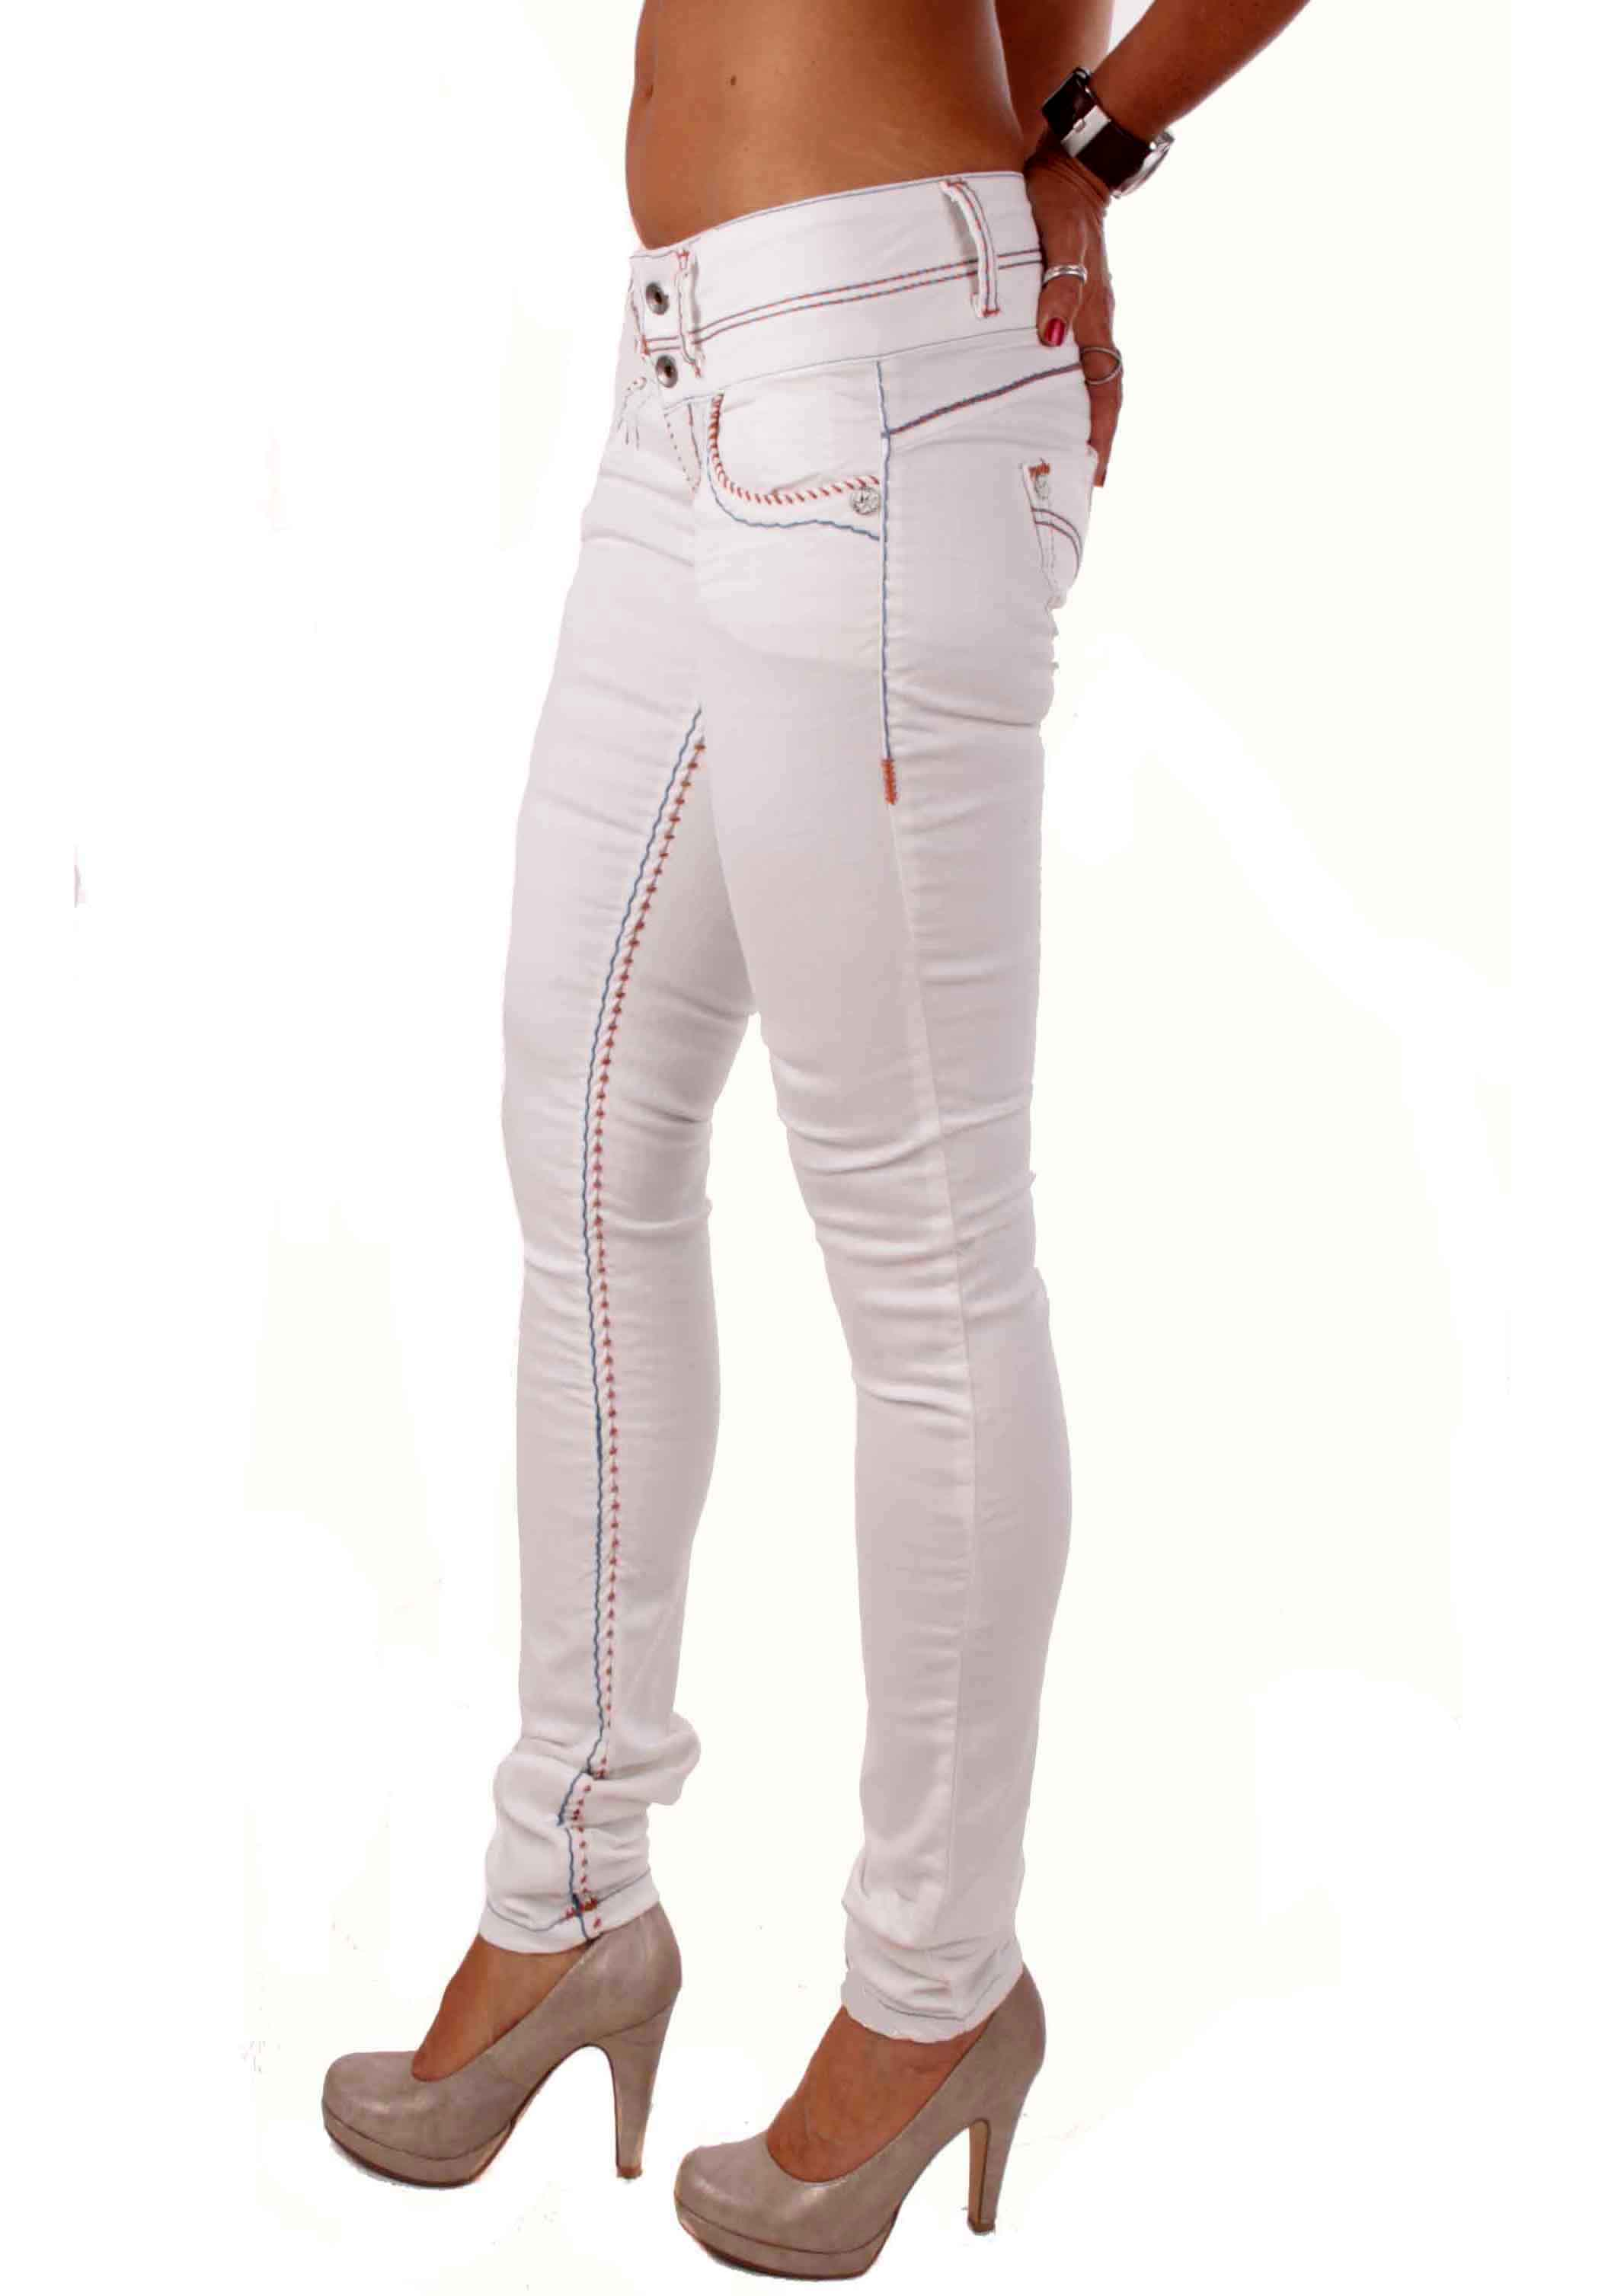 cipo baxx damen jeans hose dicke n hte cbw 0441 creme ebay. Black Bedroom Furniture Sets. Home Design Ideas